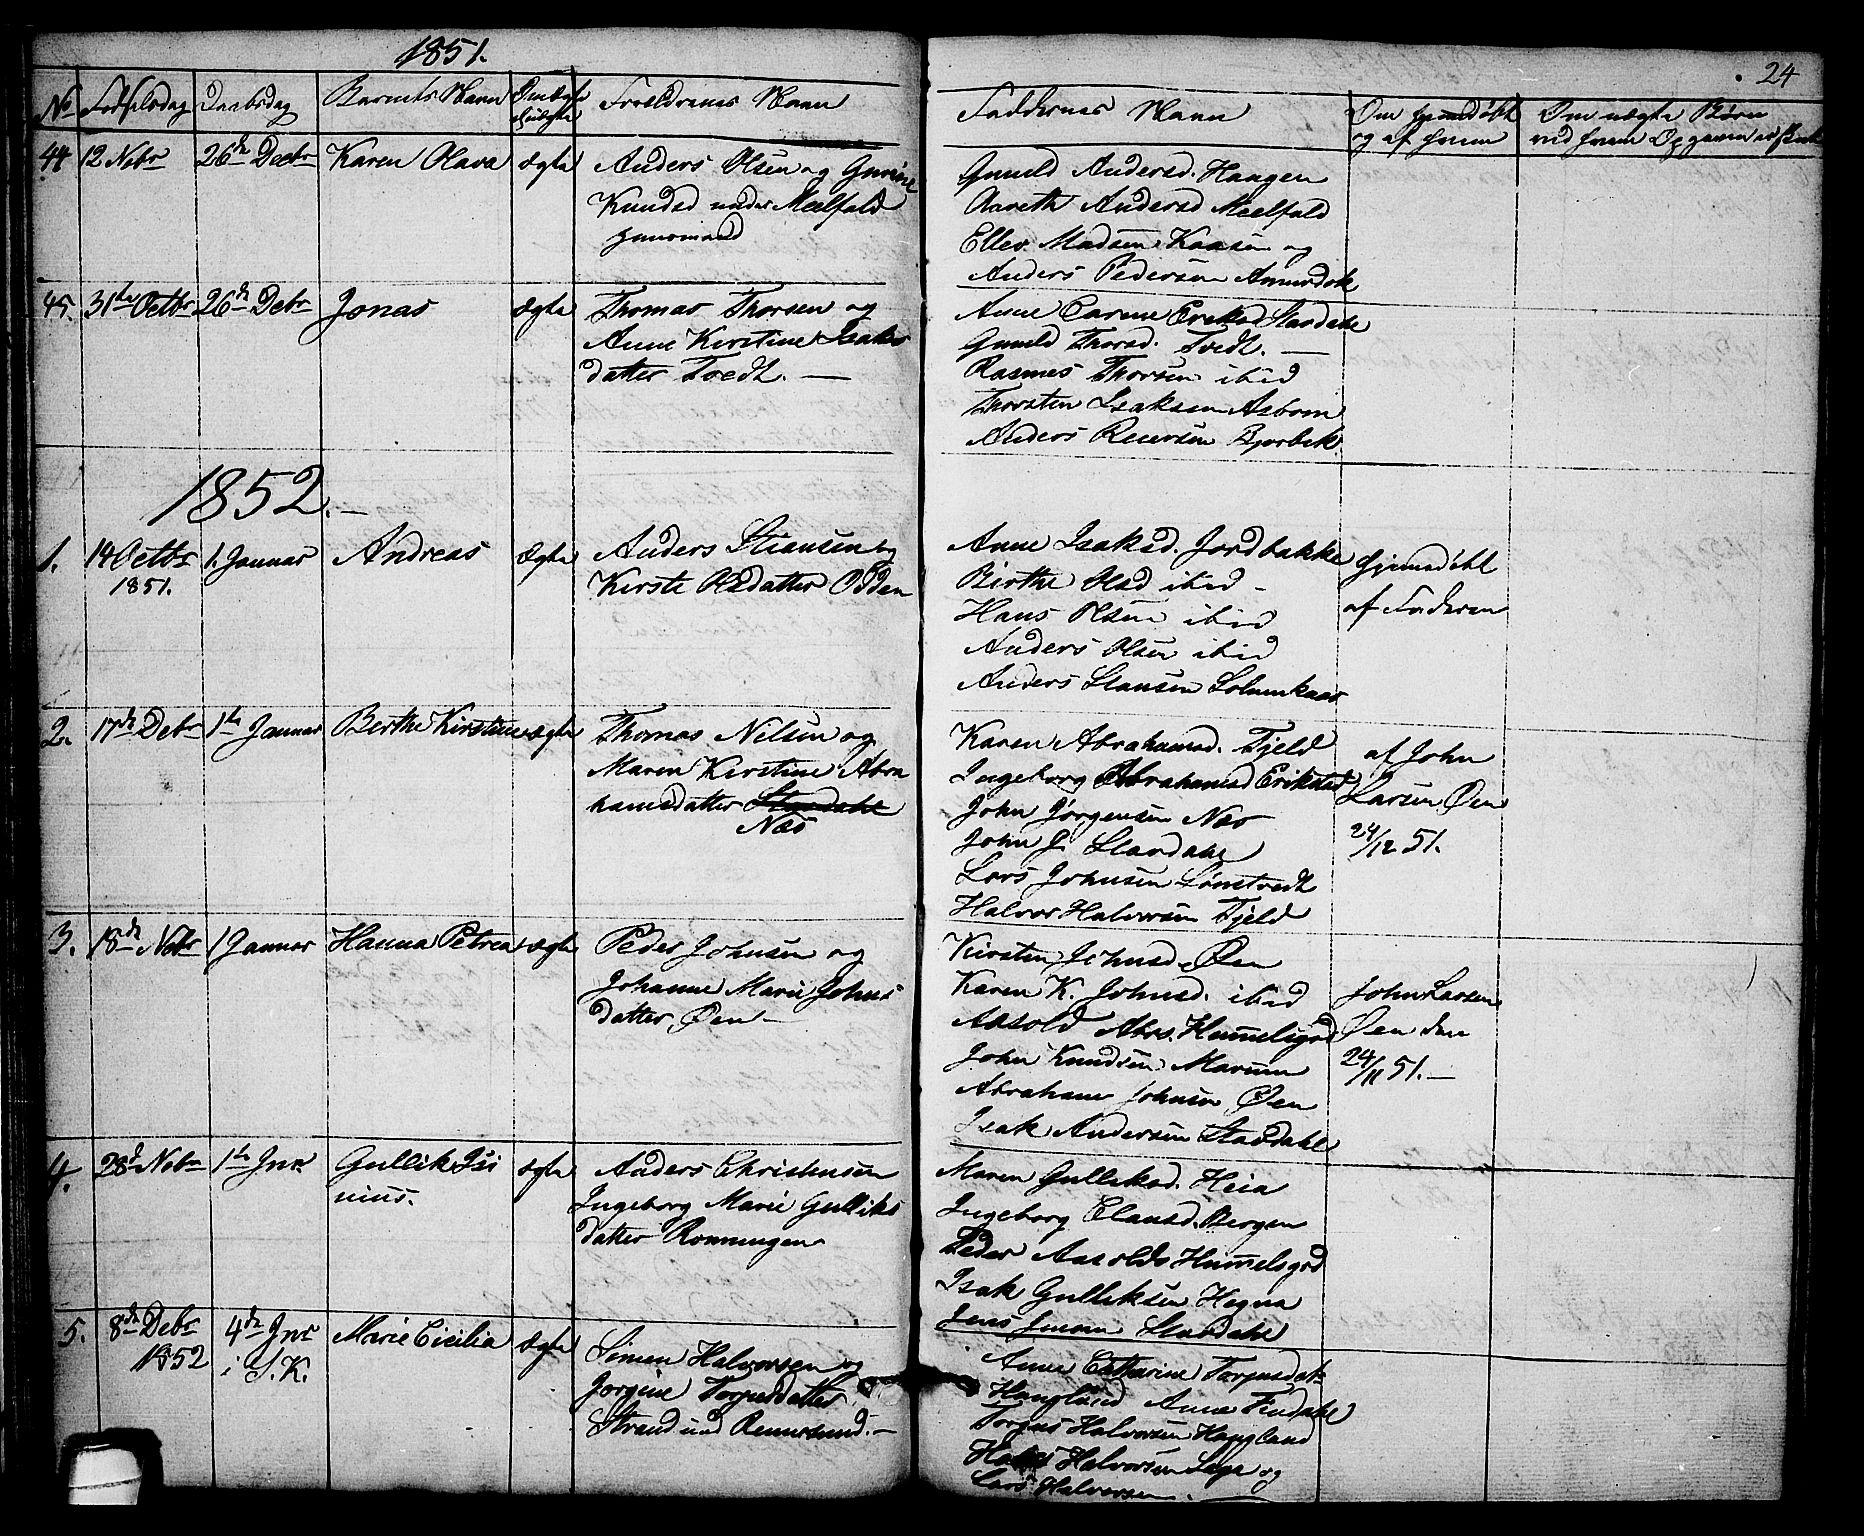 SAKO, Solum kirkebøker, G/Gb/L0001: Klokkerbok nr. II 1, 1848-1859, s. 24